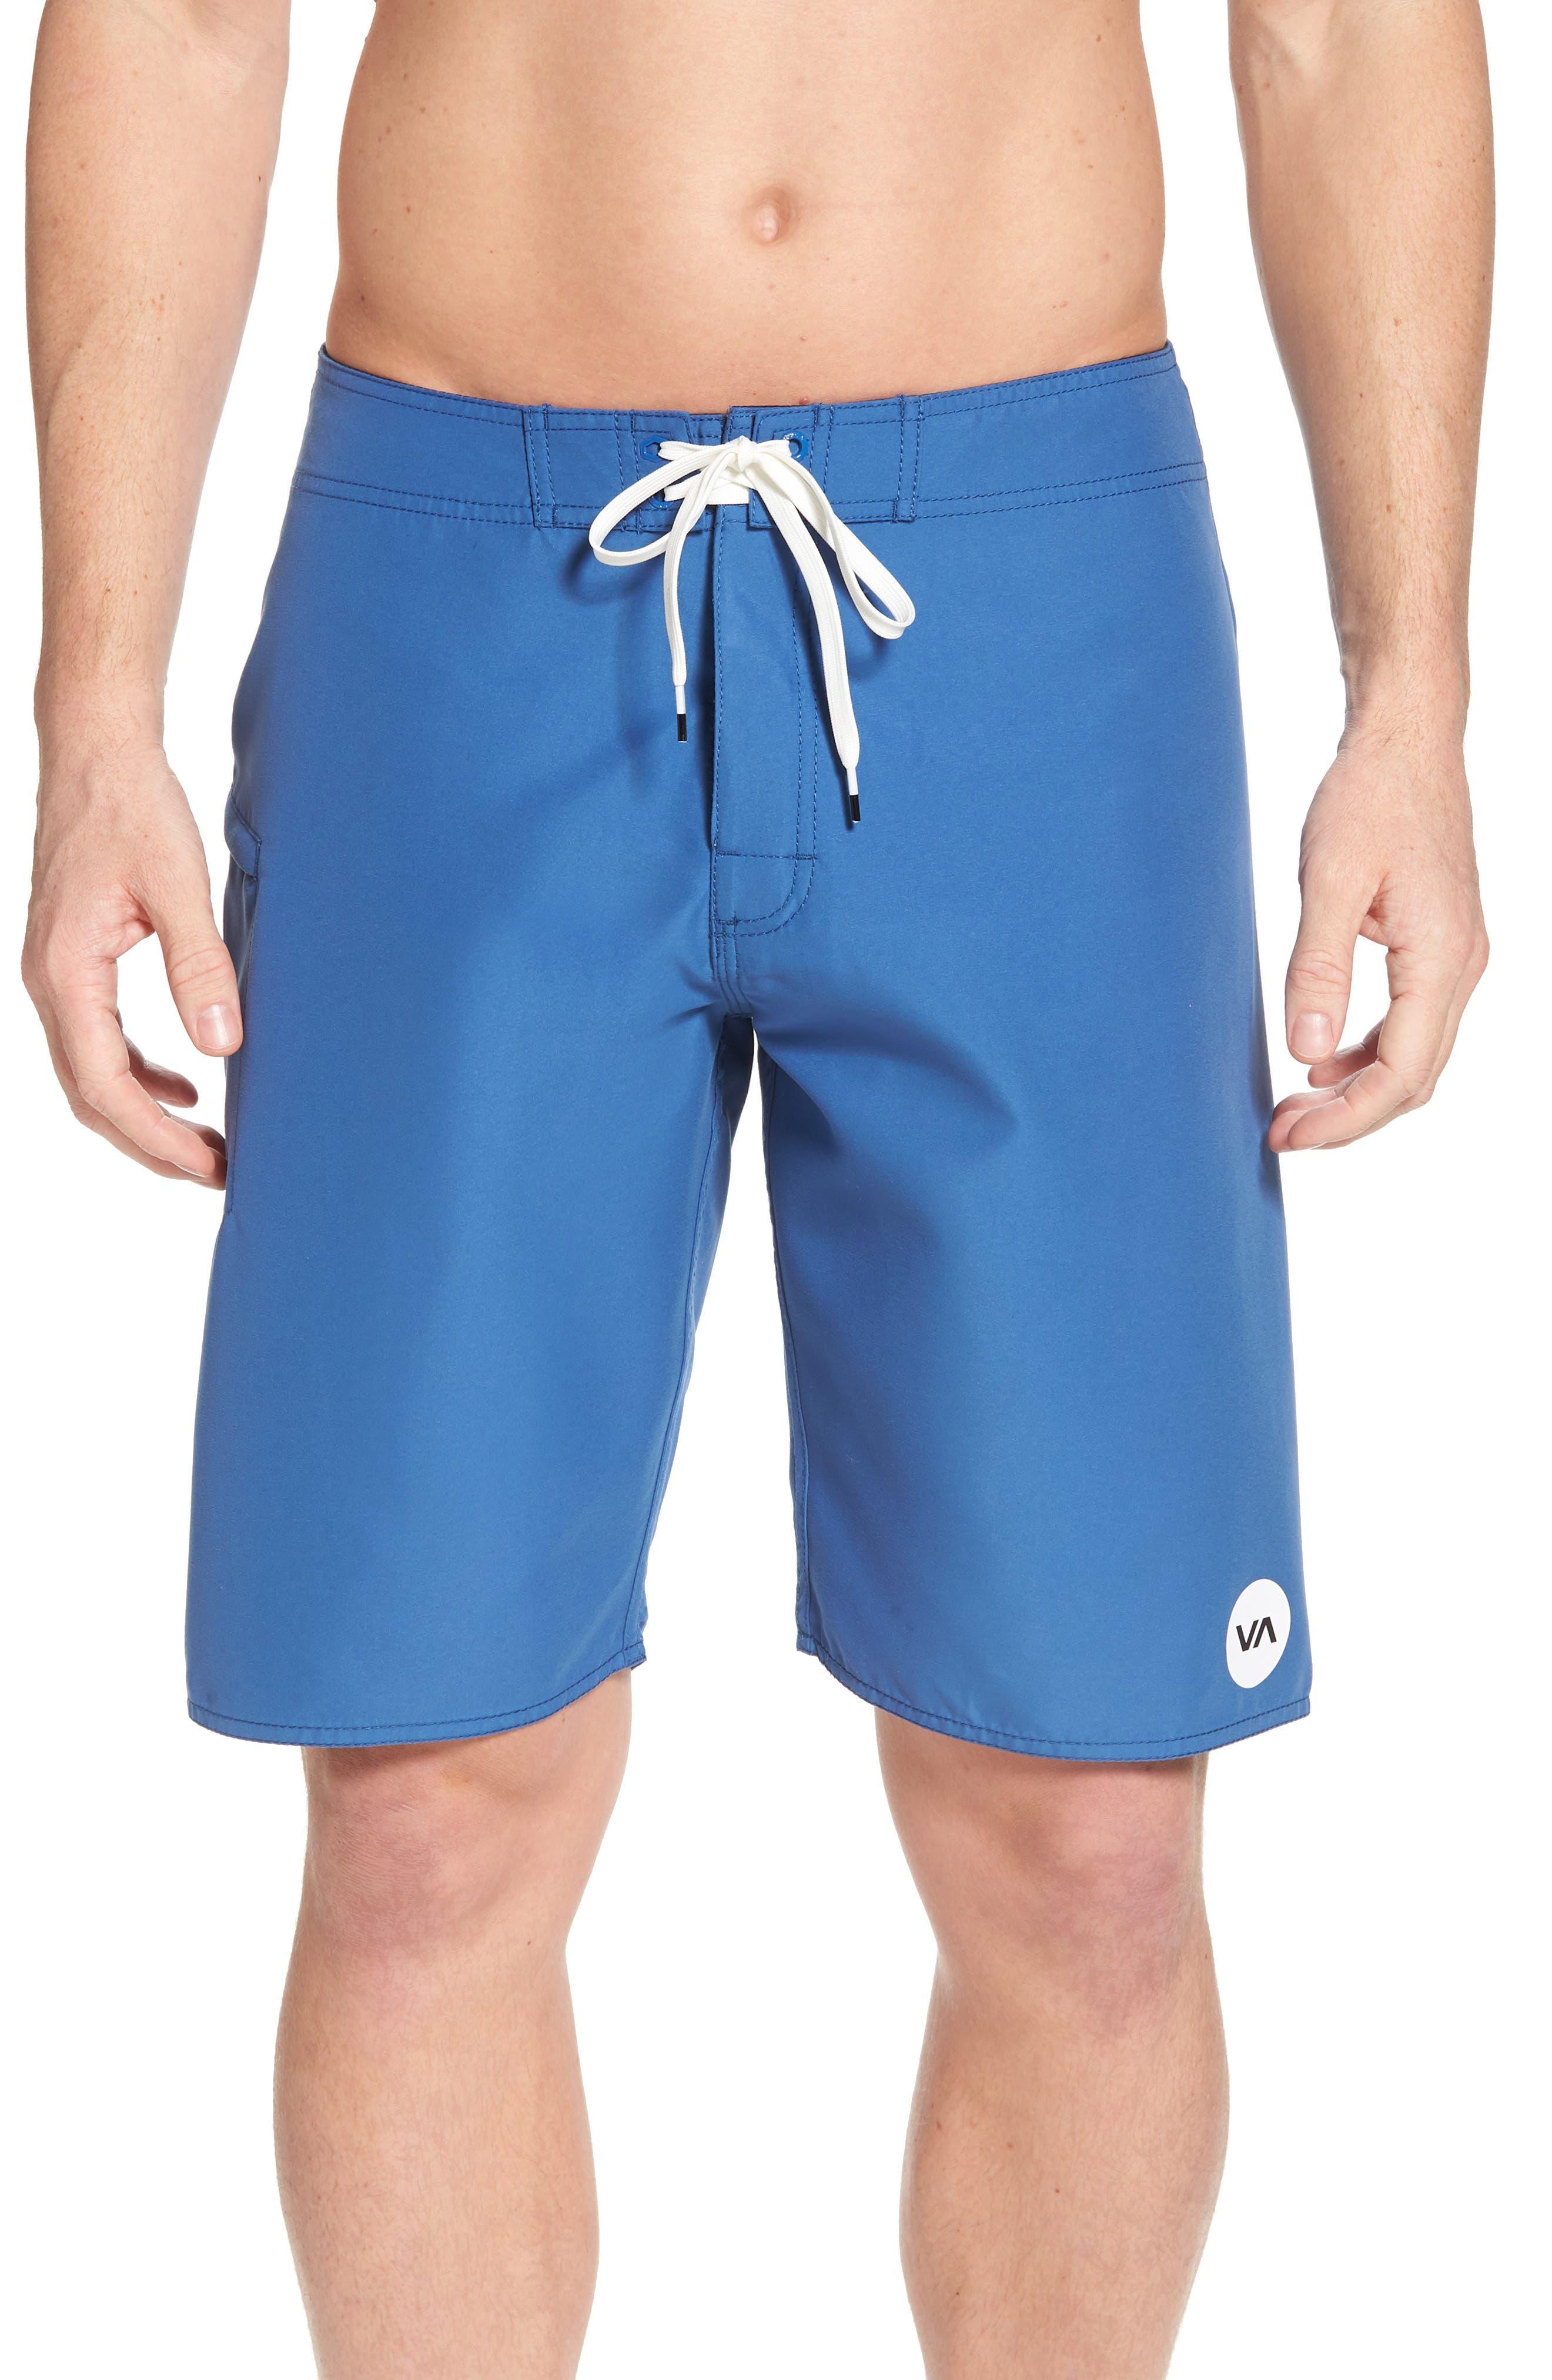 Upper Board Shorts,                             Main thumbnail 1, color,                             Cobalt